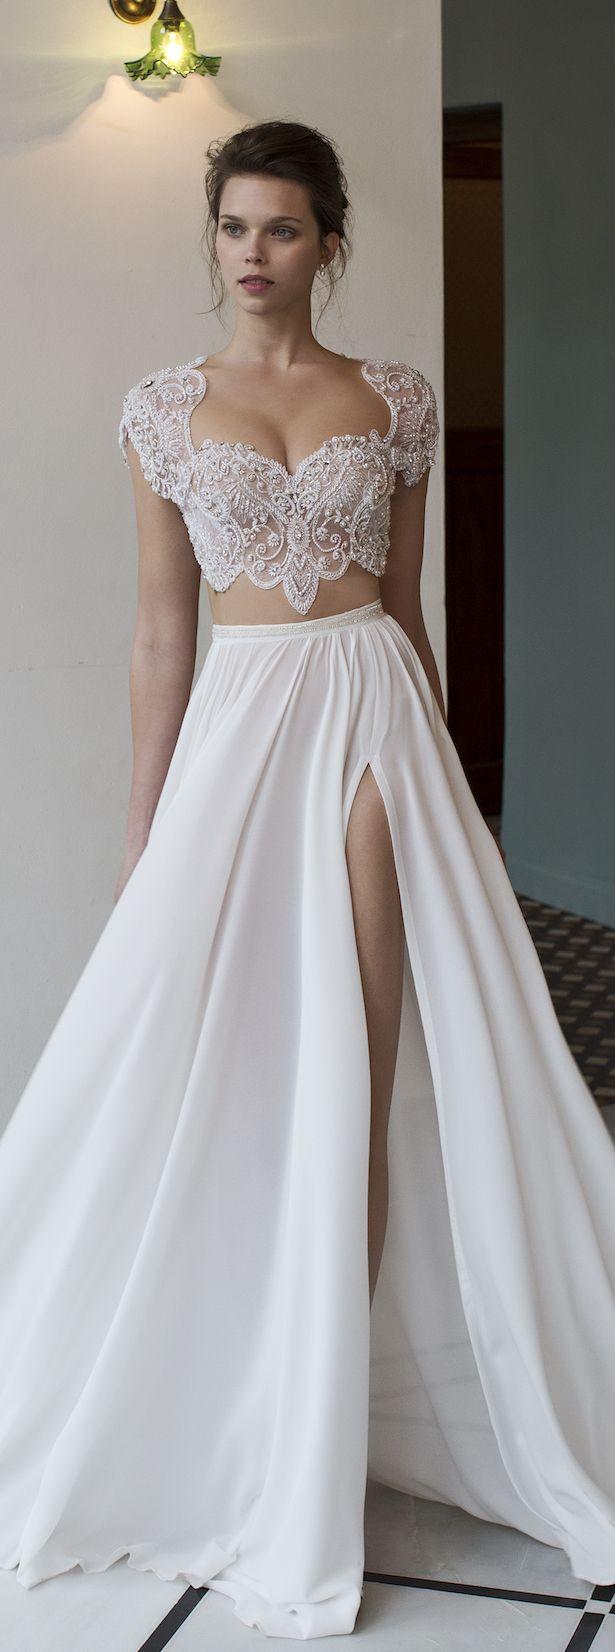 Bridal Trends: Two- Piece Wedding Dresses | Pinterest | Verona ...